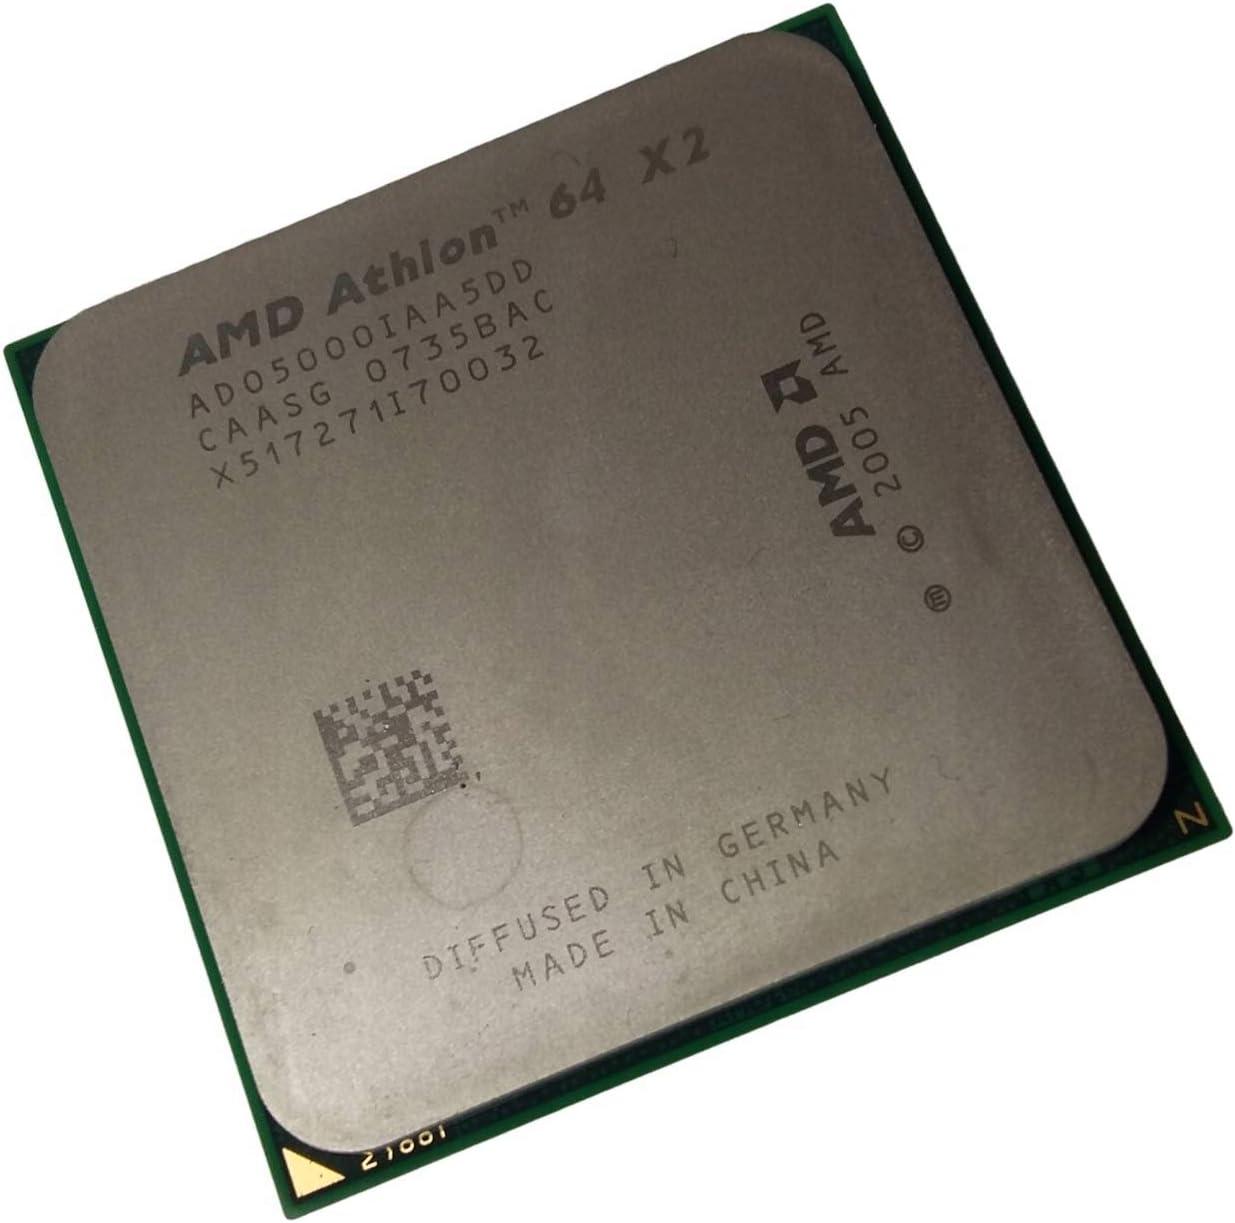 Amazon Com Amd Athlon 64 X2 5000 Am2 65w 2 6 Ghz Dual Core Cpu Low Wattage Ado5000iaa5do Computers Accessories